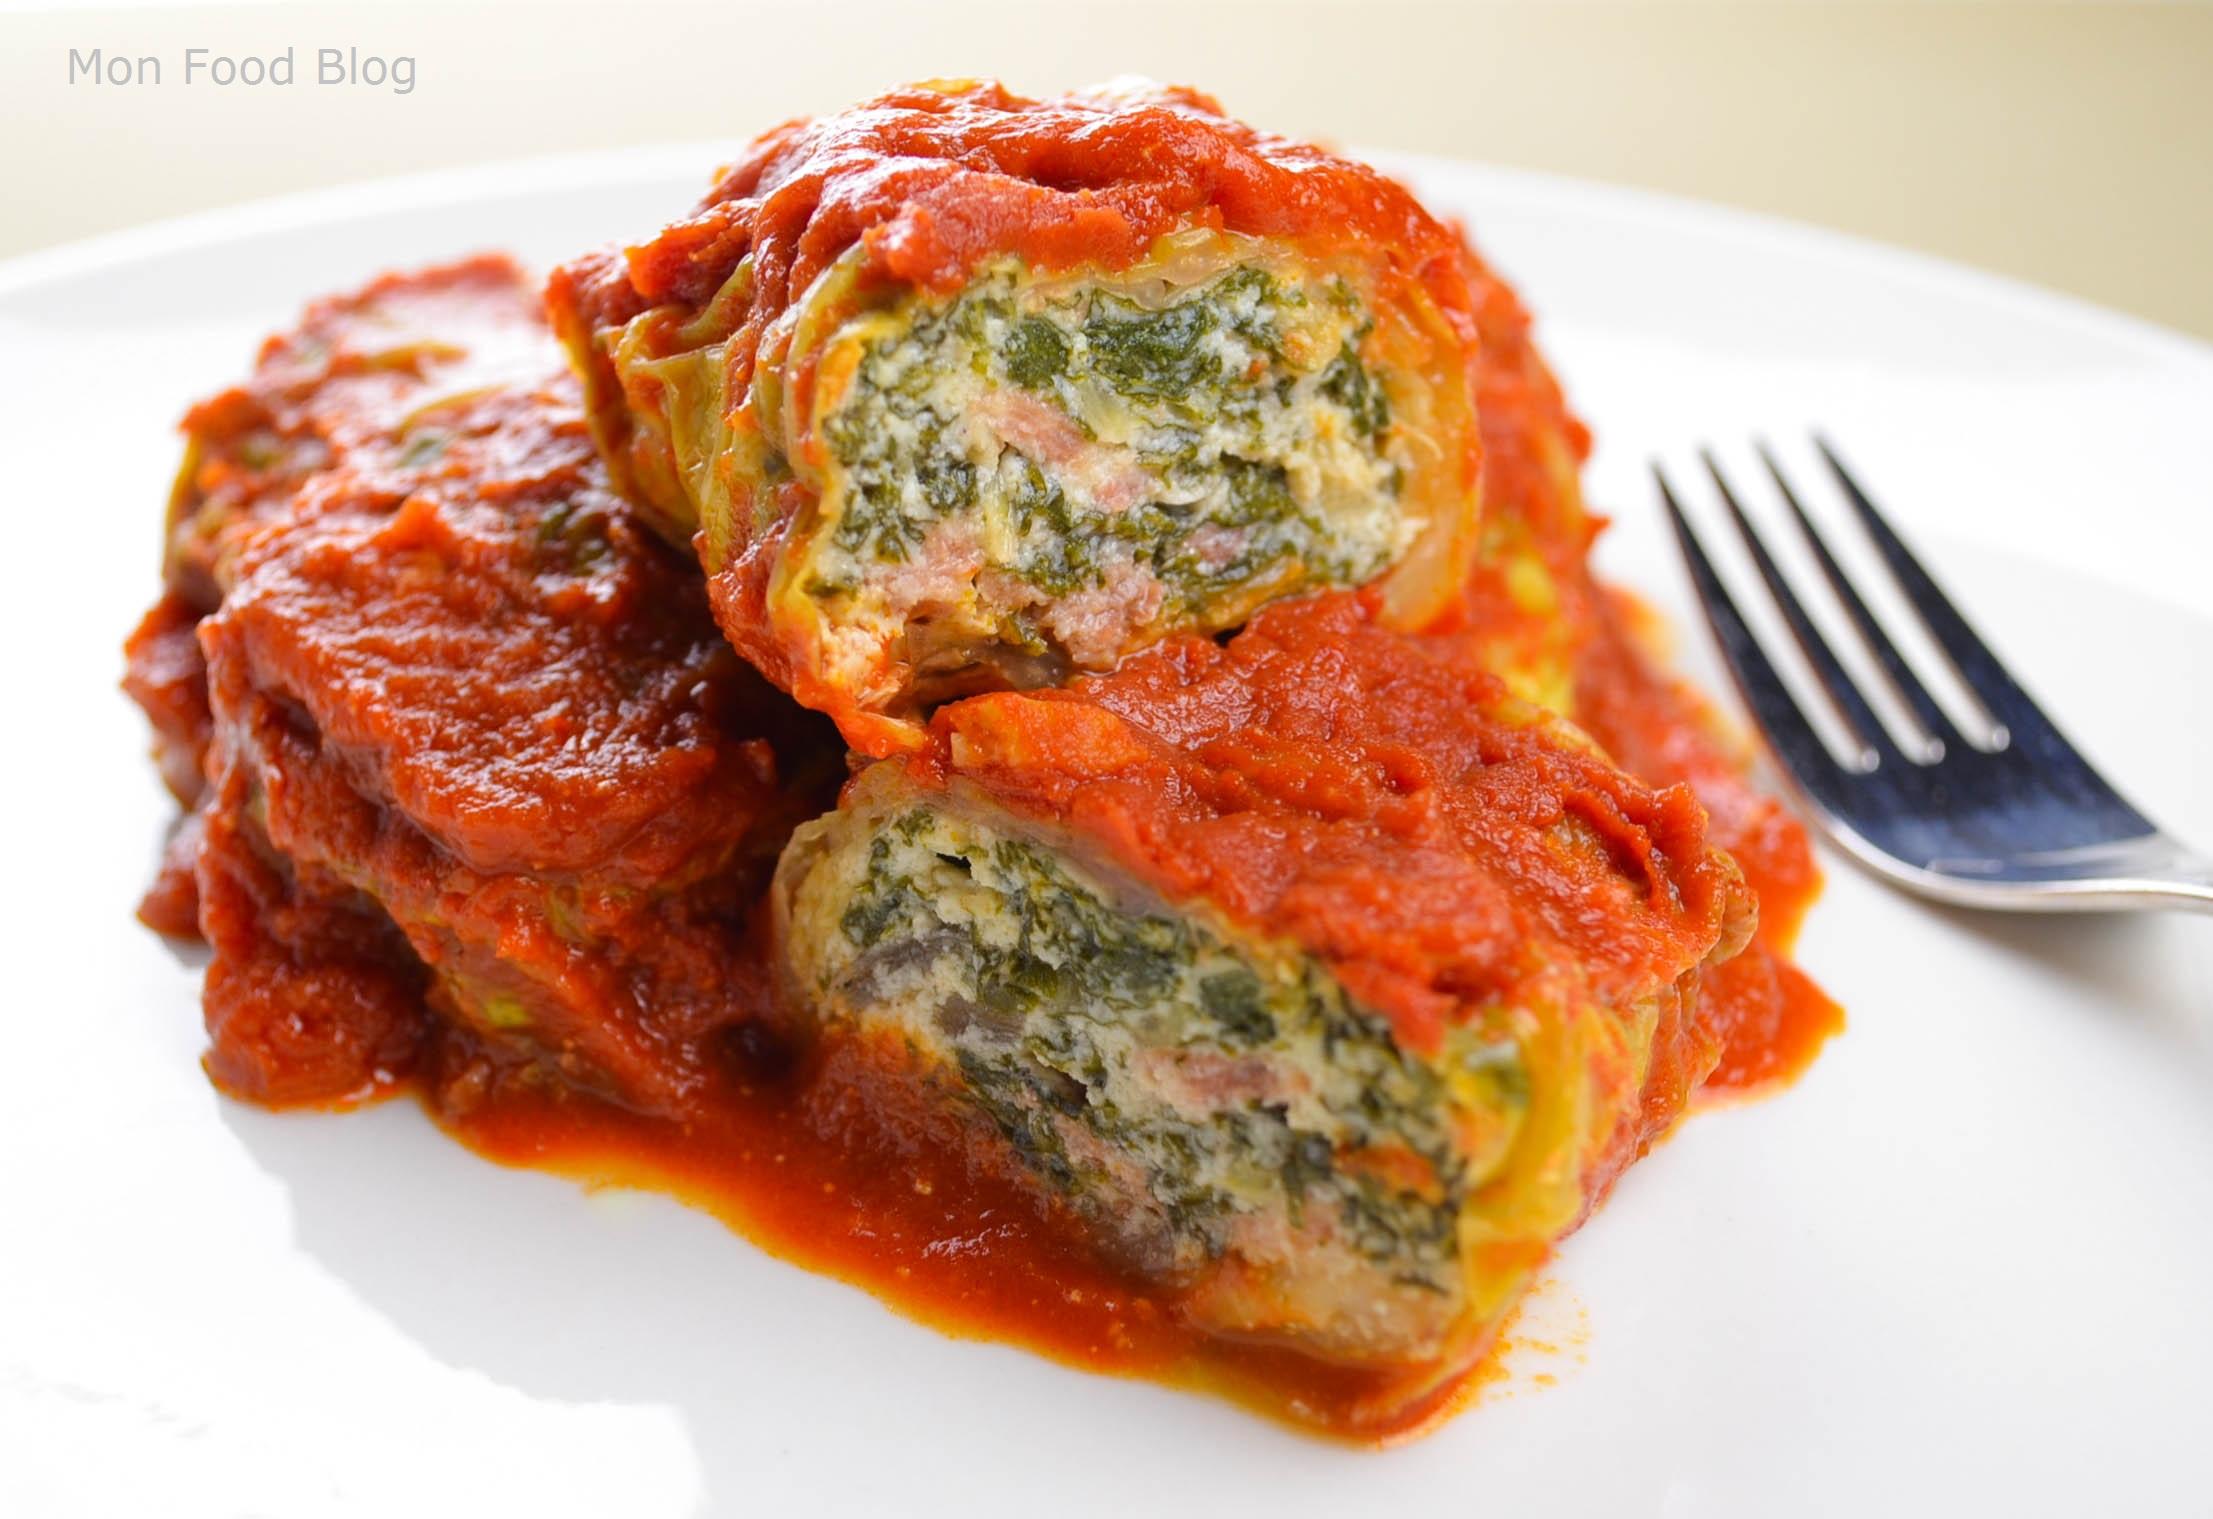 ... September 27, 2012 at 2213 × 1519 in Vegetarian cabbage rolls